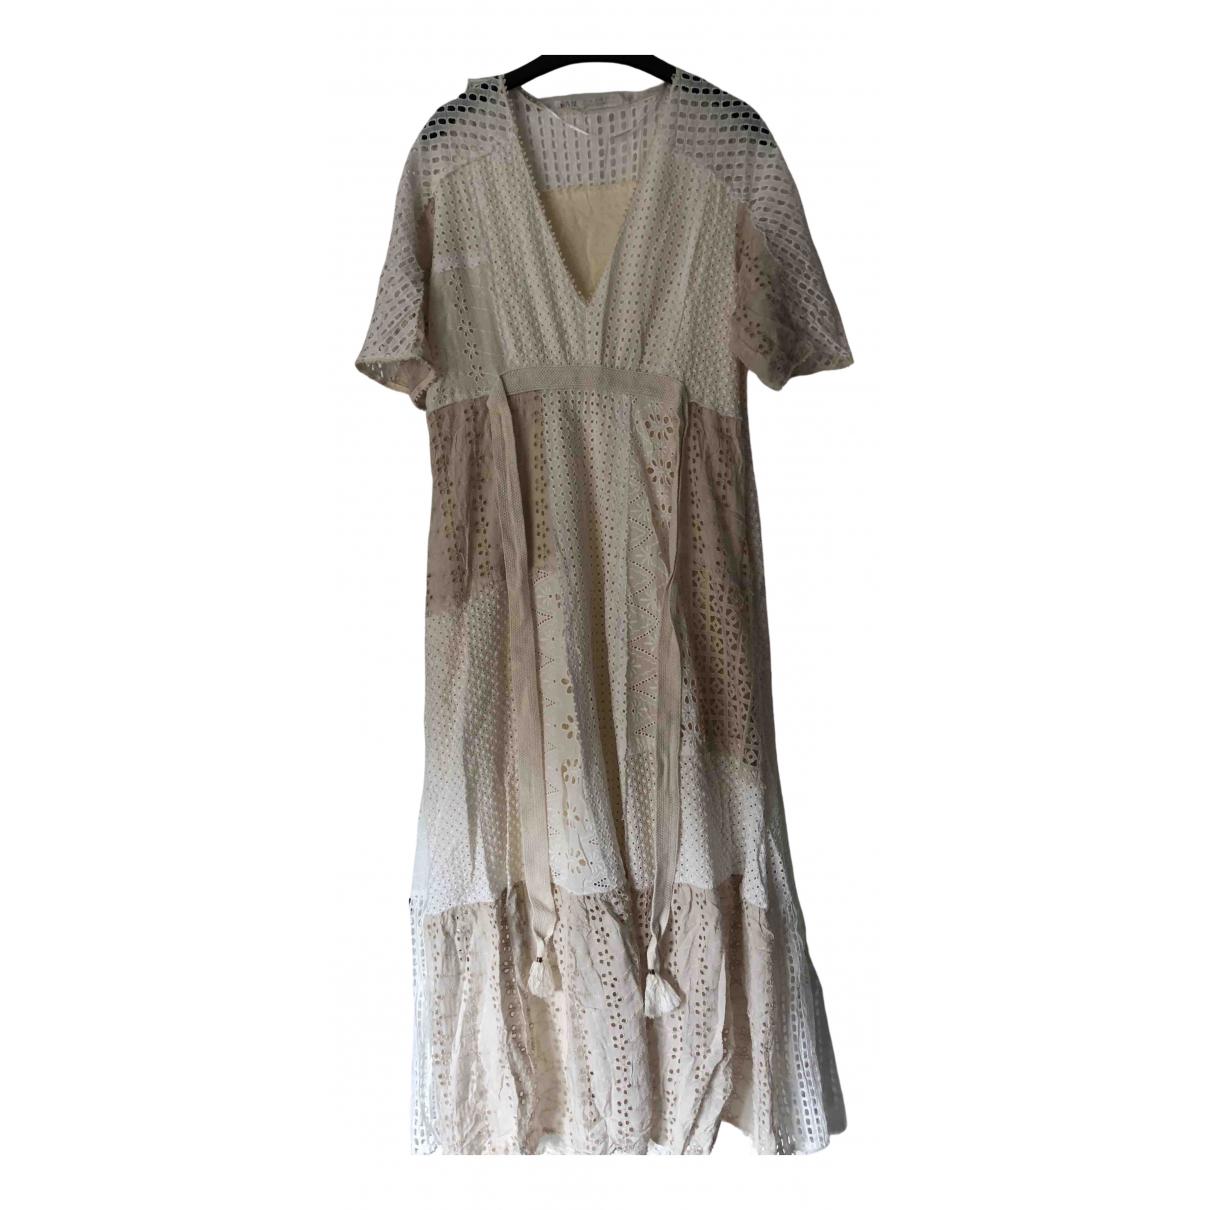 Zara \N Beige Cotton dress for Women M International